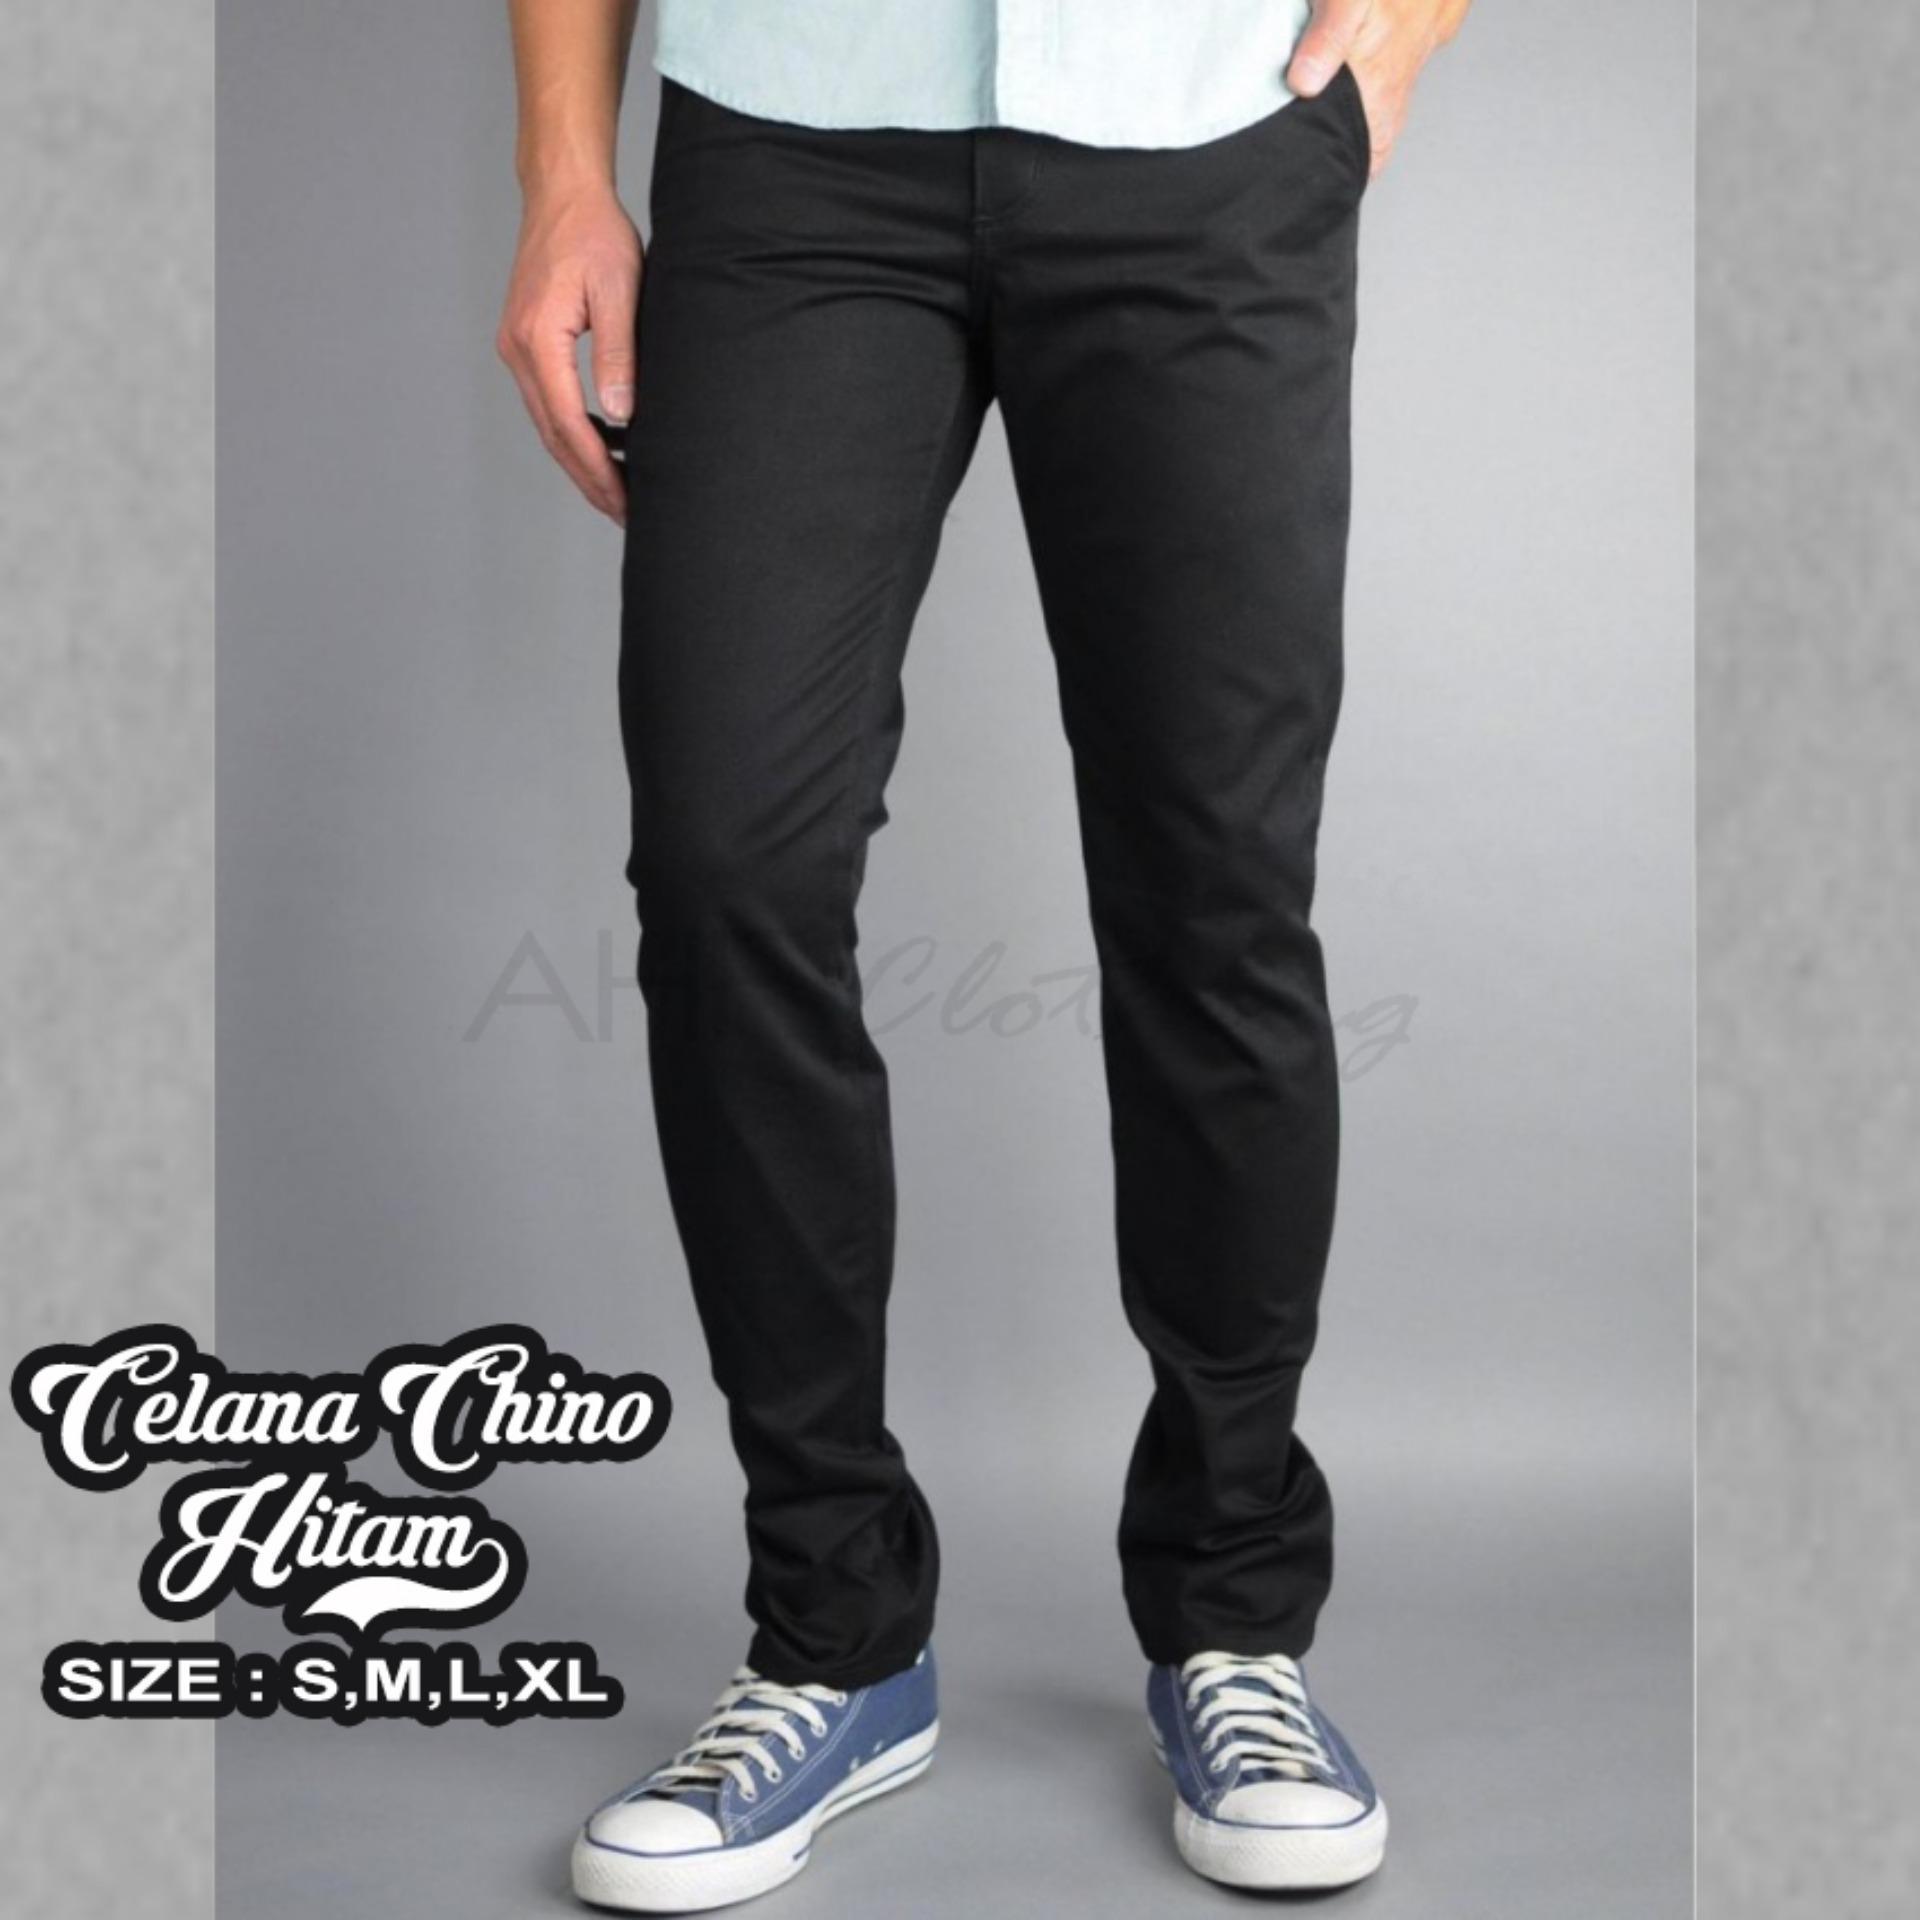 Celana Panjang Chino/Chinos Pria/Cowok - Krem(Cream)/Hitam(Black)/Abu(Grey)